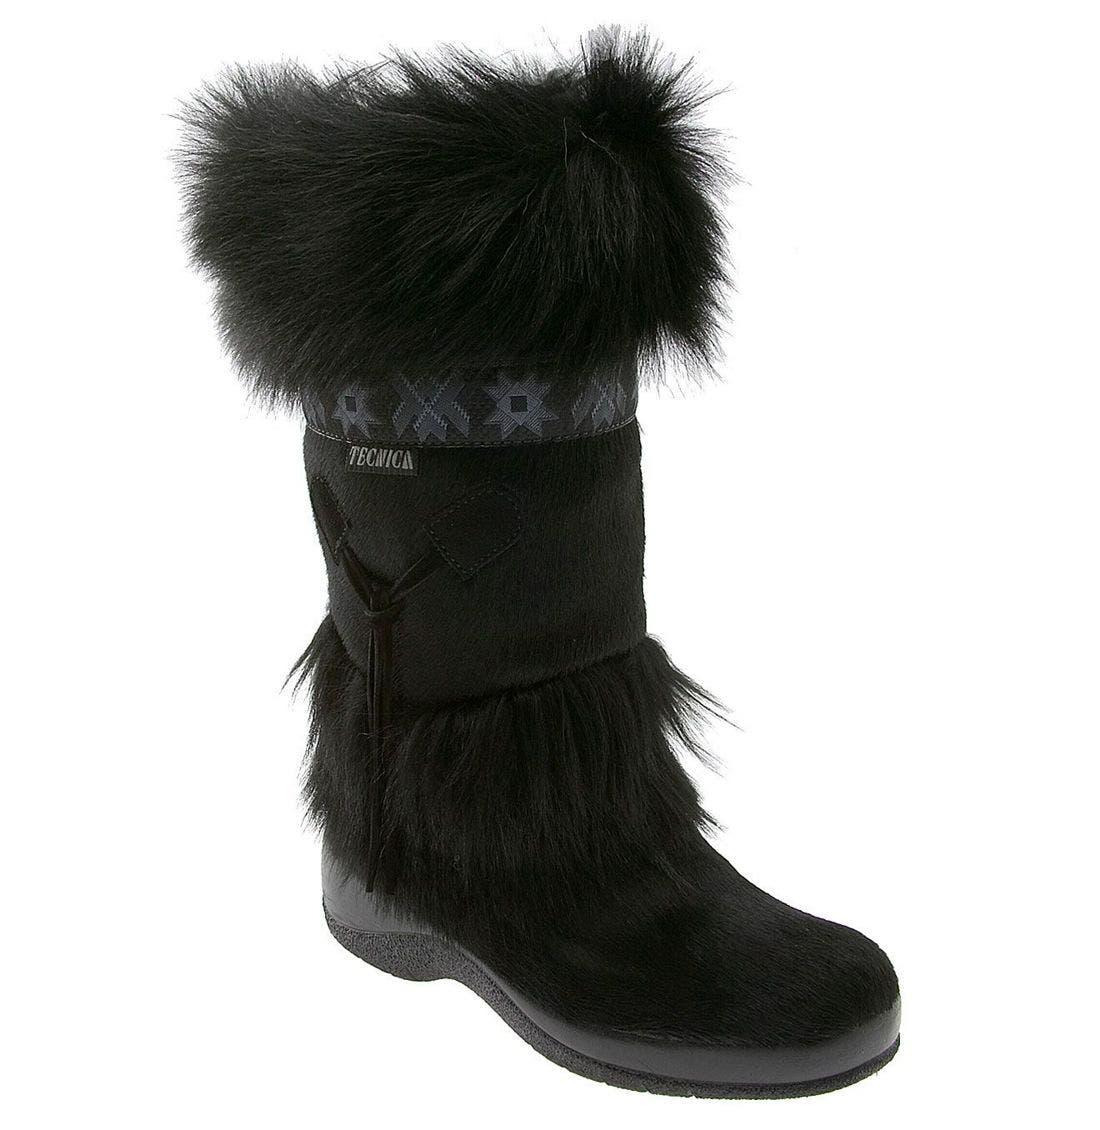 Alternate Image 1 Selected - Tecnica® 'Skandia' Boot